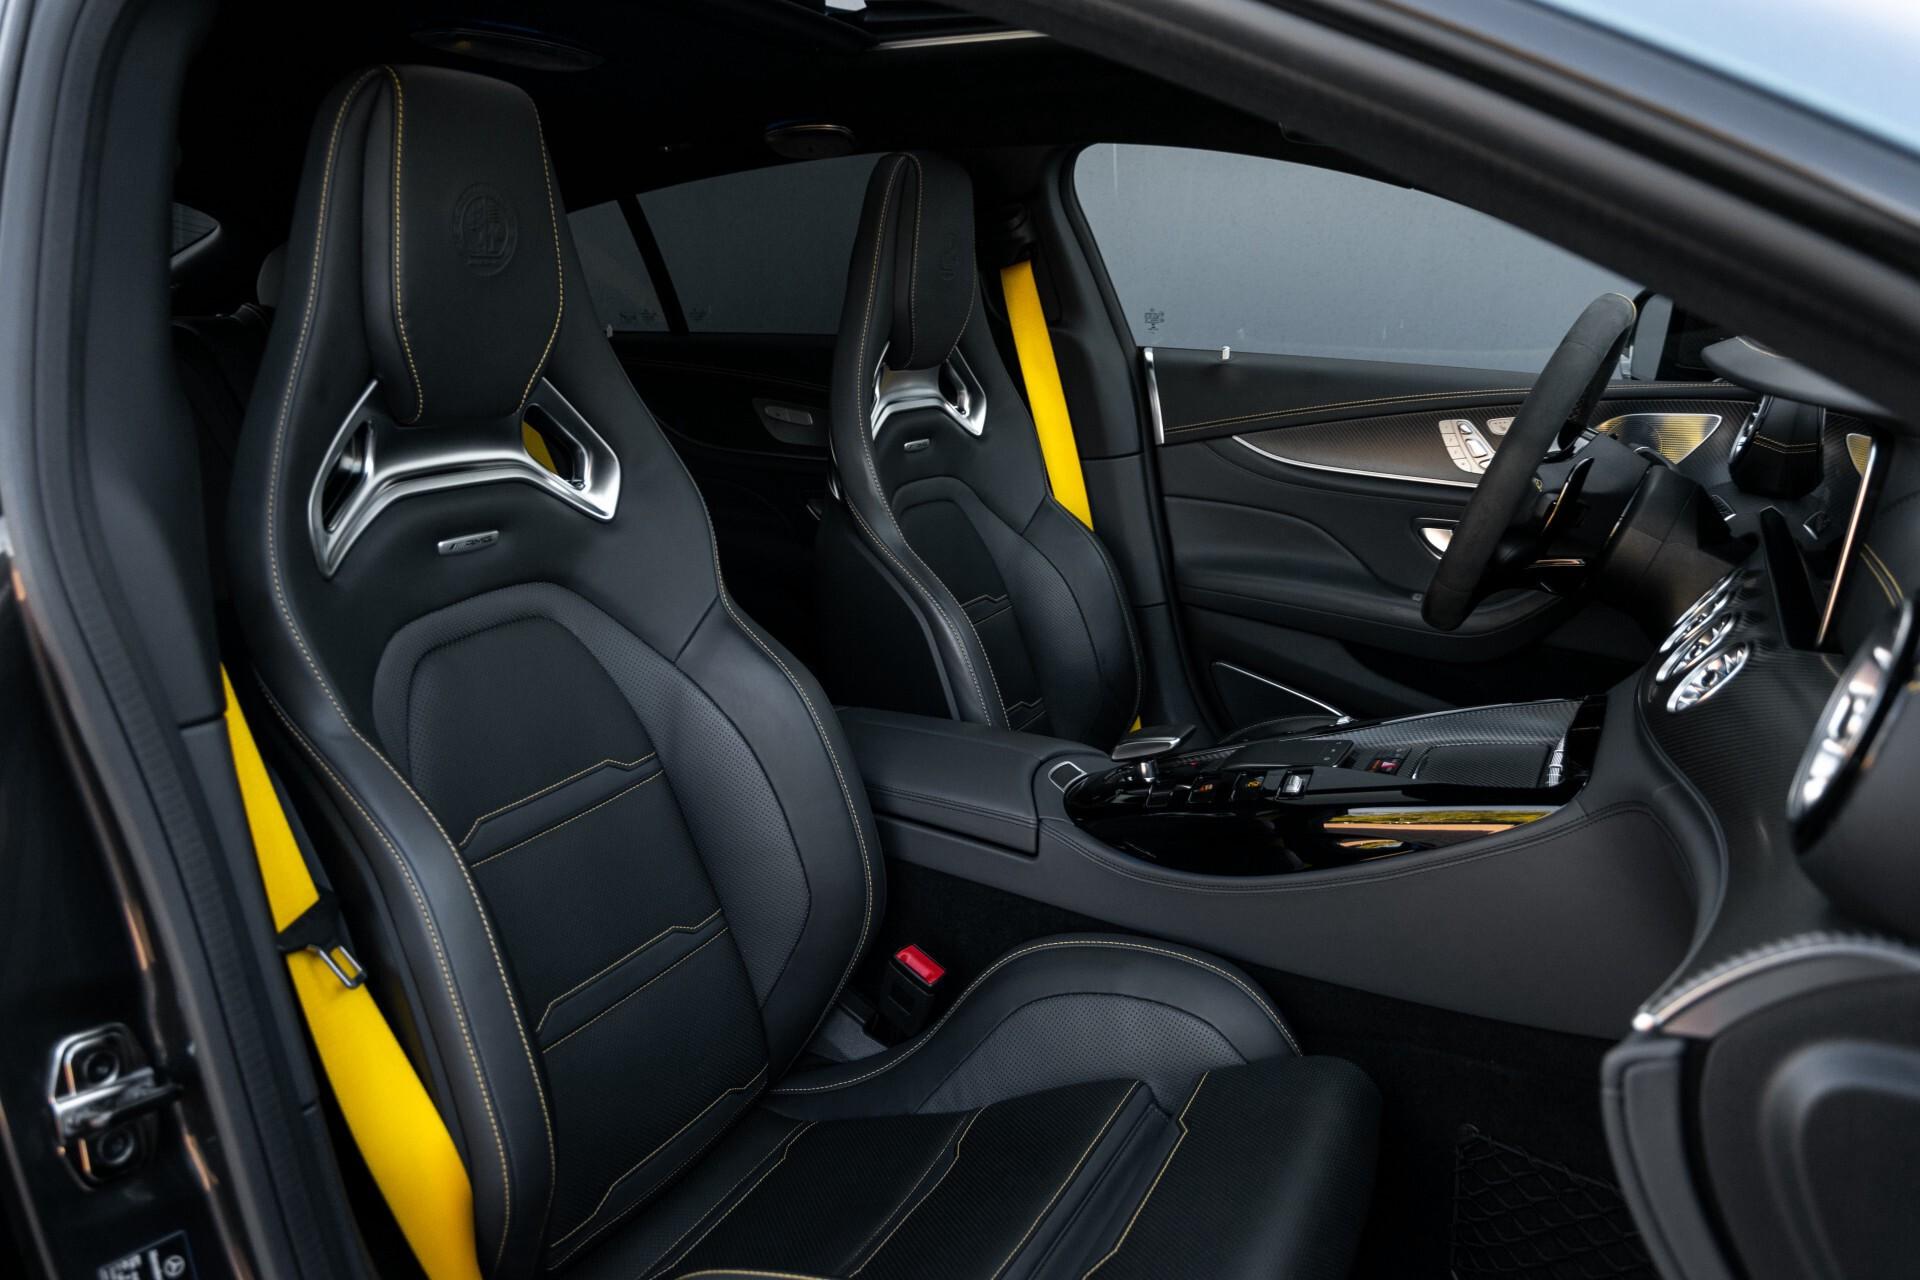 Mercedes-Benz AMG GT 4-Door Coupe 63 S 4MATIC+ Edition 1 Keramisch/Carbon/First Class/Dynamic Plus/Burmester High End 3D Aut9 Foto 4